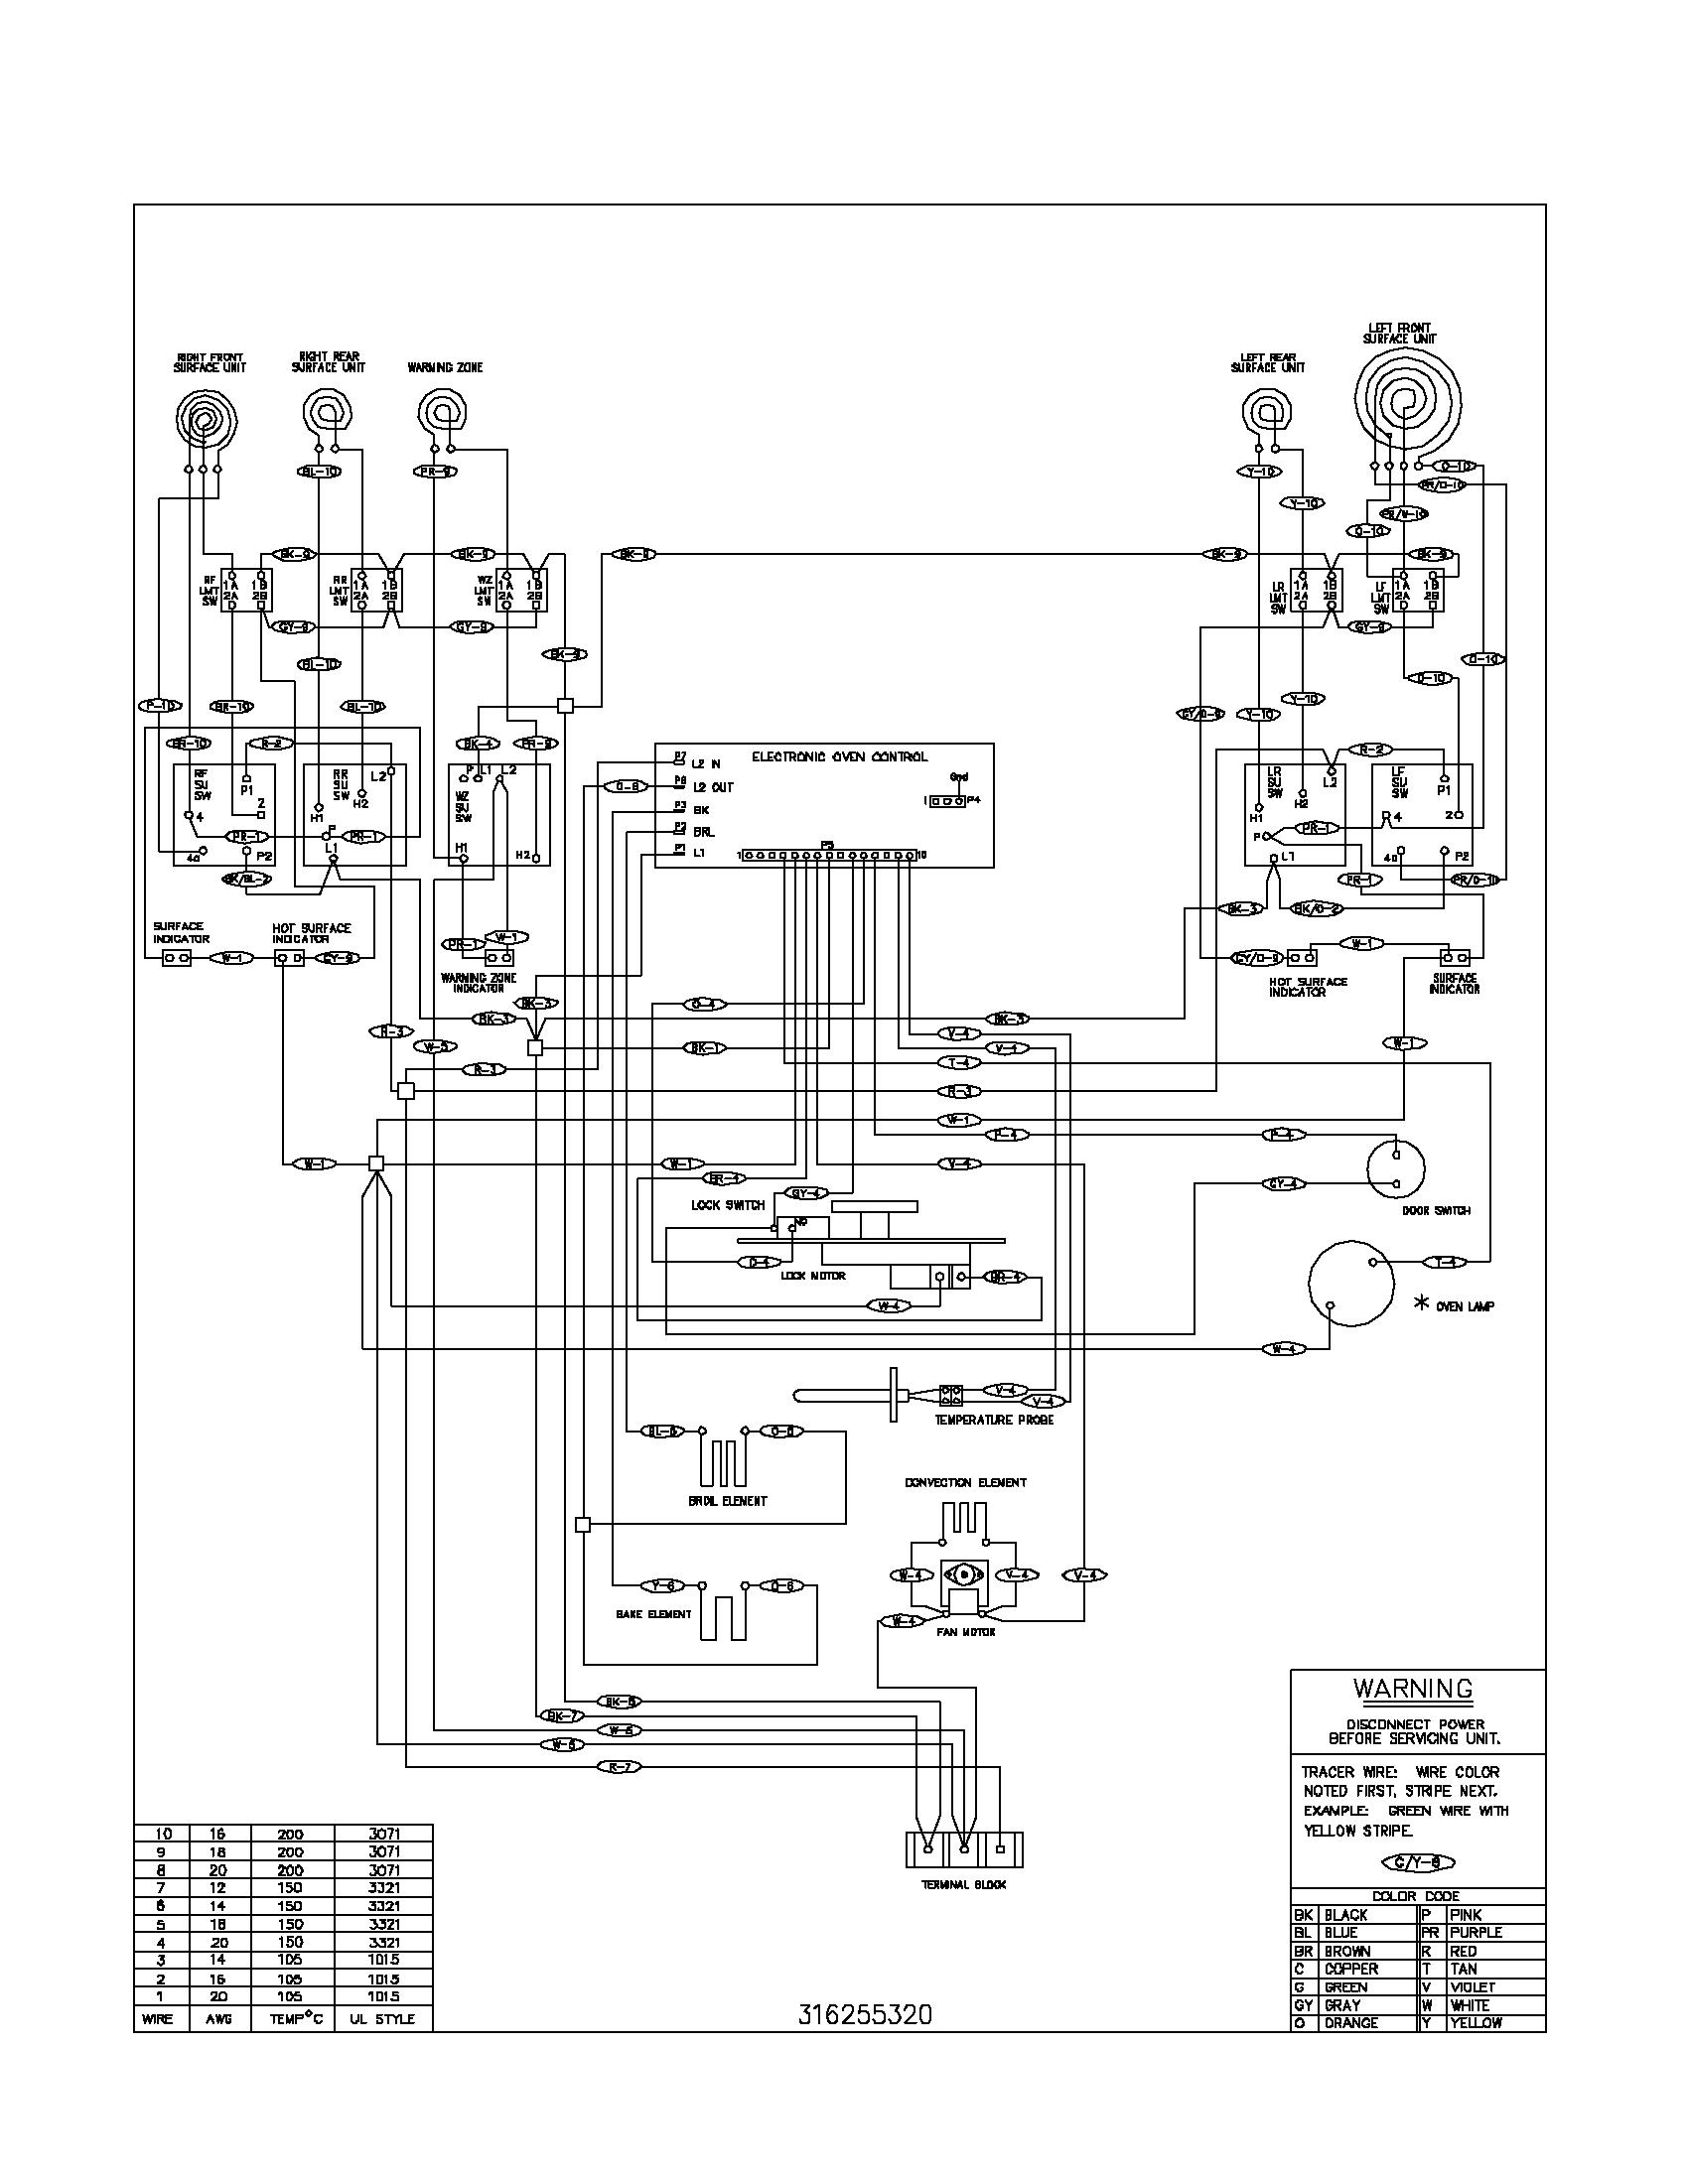 6 Volt Flasher Wiring Diagram 29 Wiring Diagram Images